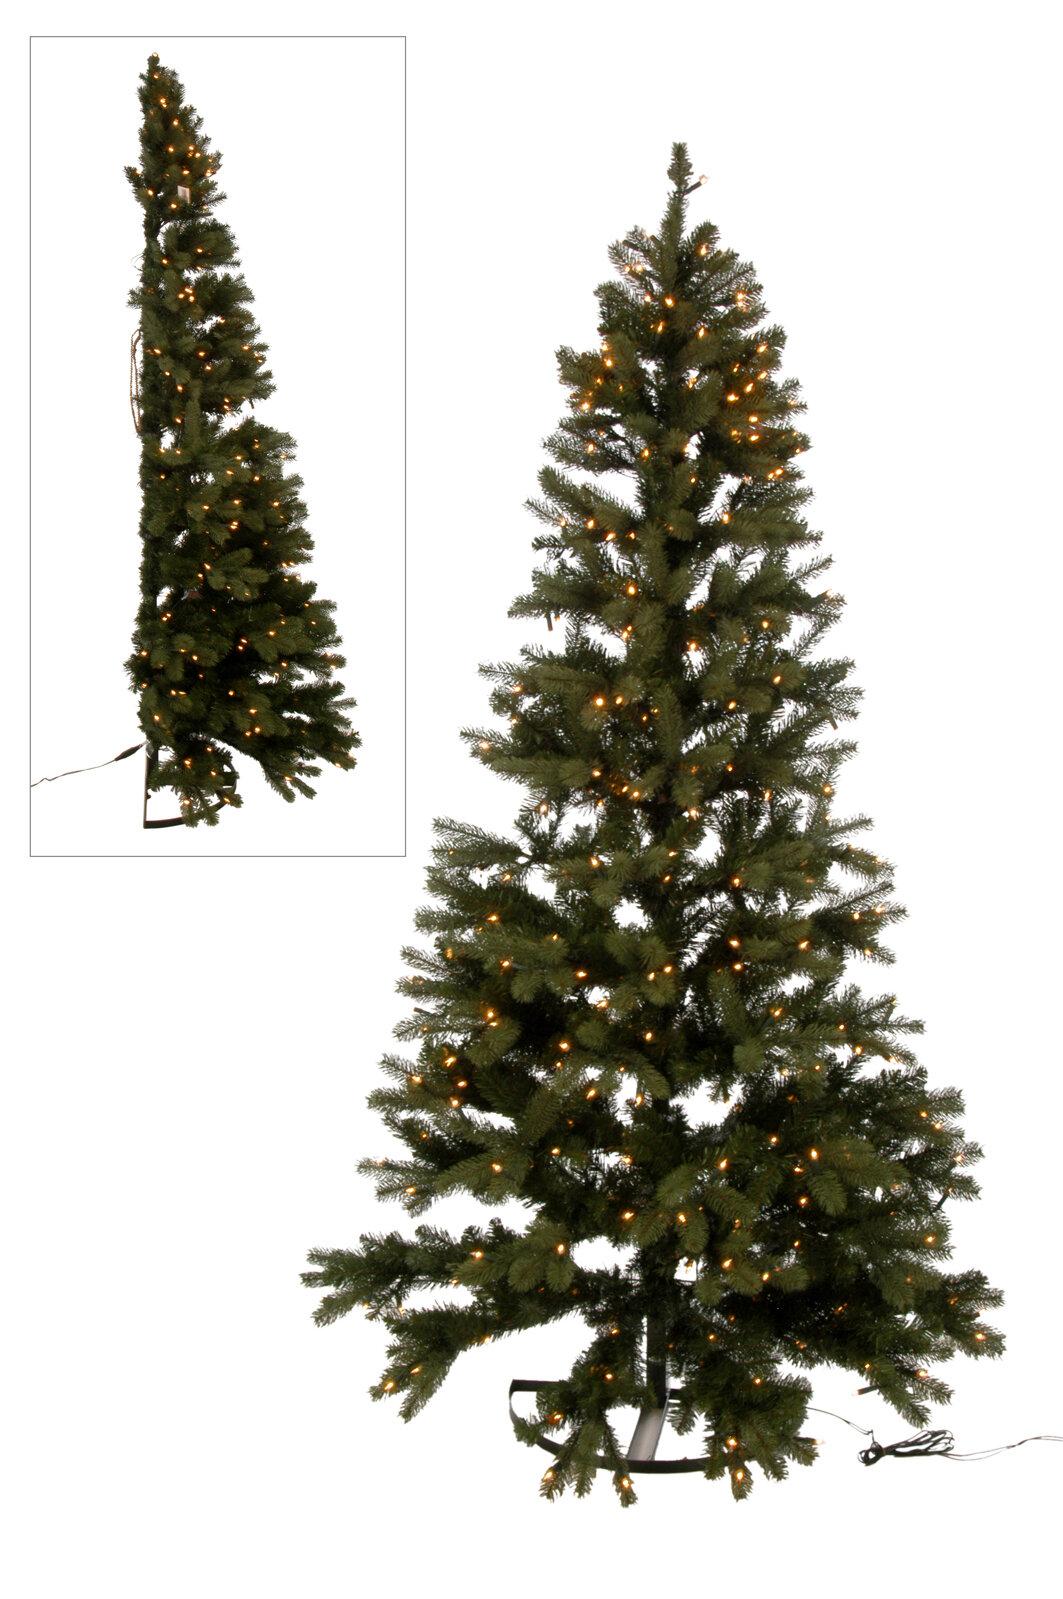 Half Christmas Tree.Half Wall Plastic 7 4ft Green Artificial Christmas Tree Coloured And White Lights